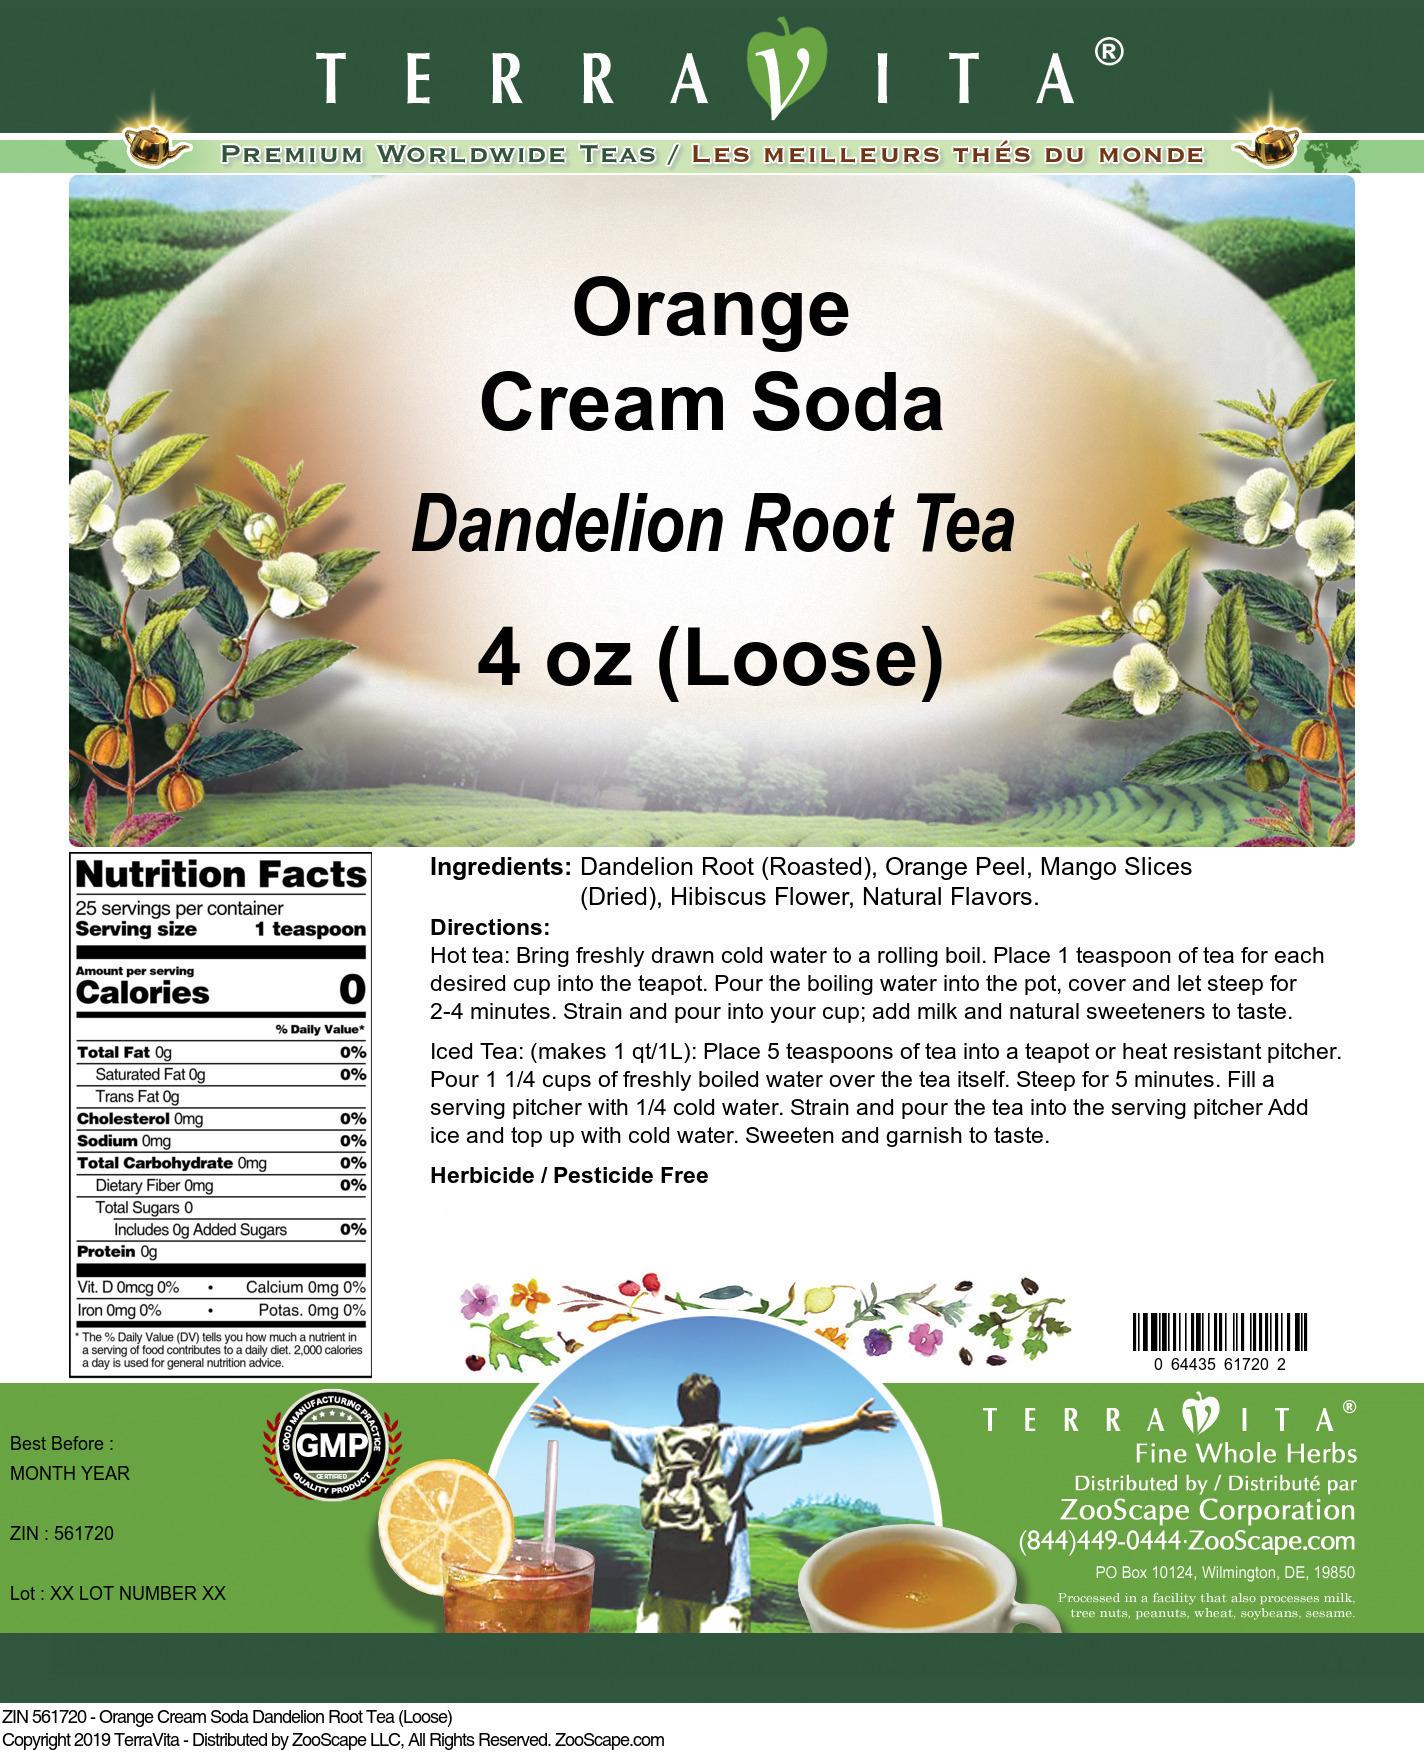 Orange Cream Soda Dandelion Root Tea (Loose)